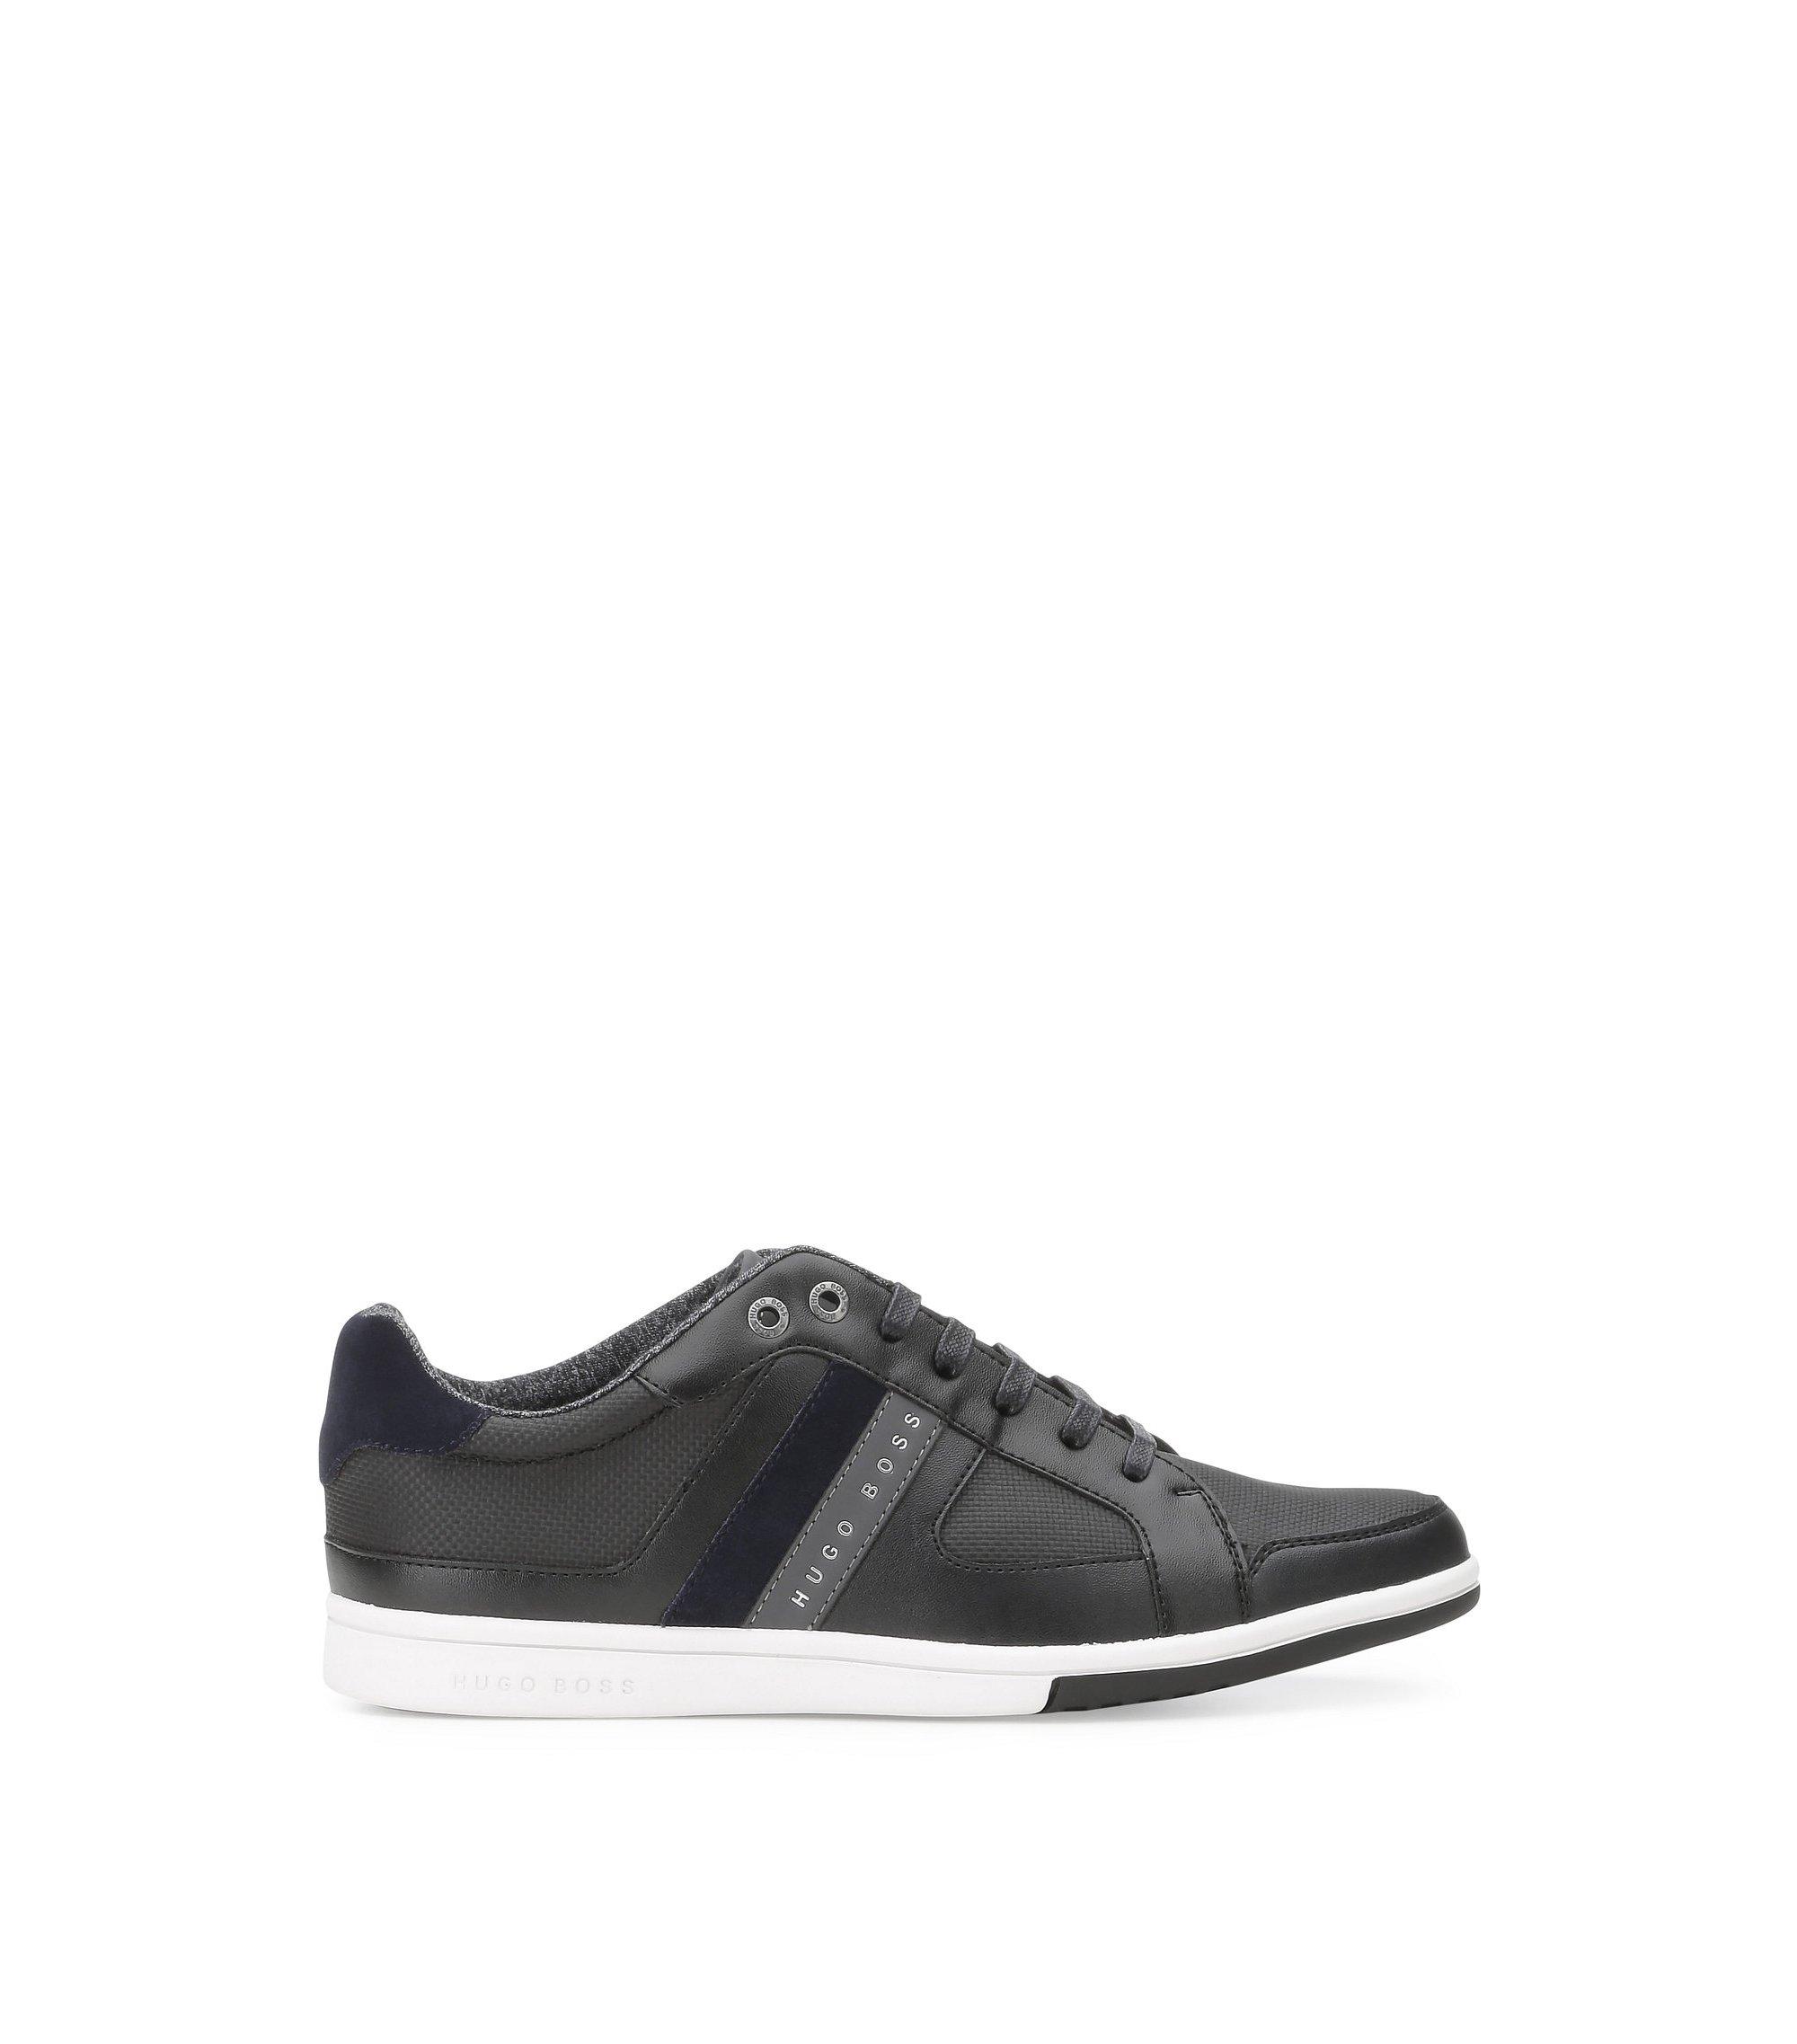 Coated Mesh Sneaker | Metro Tenn Cvc, Black